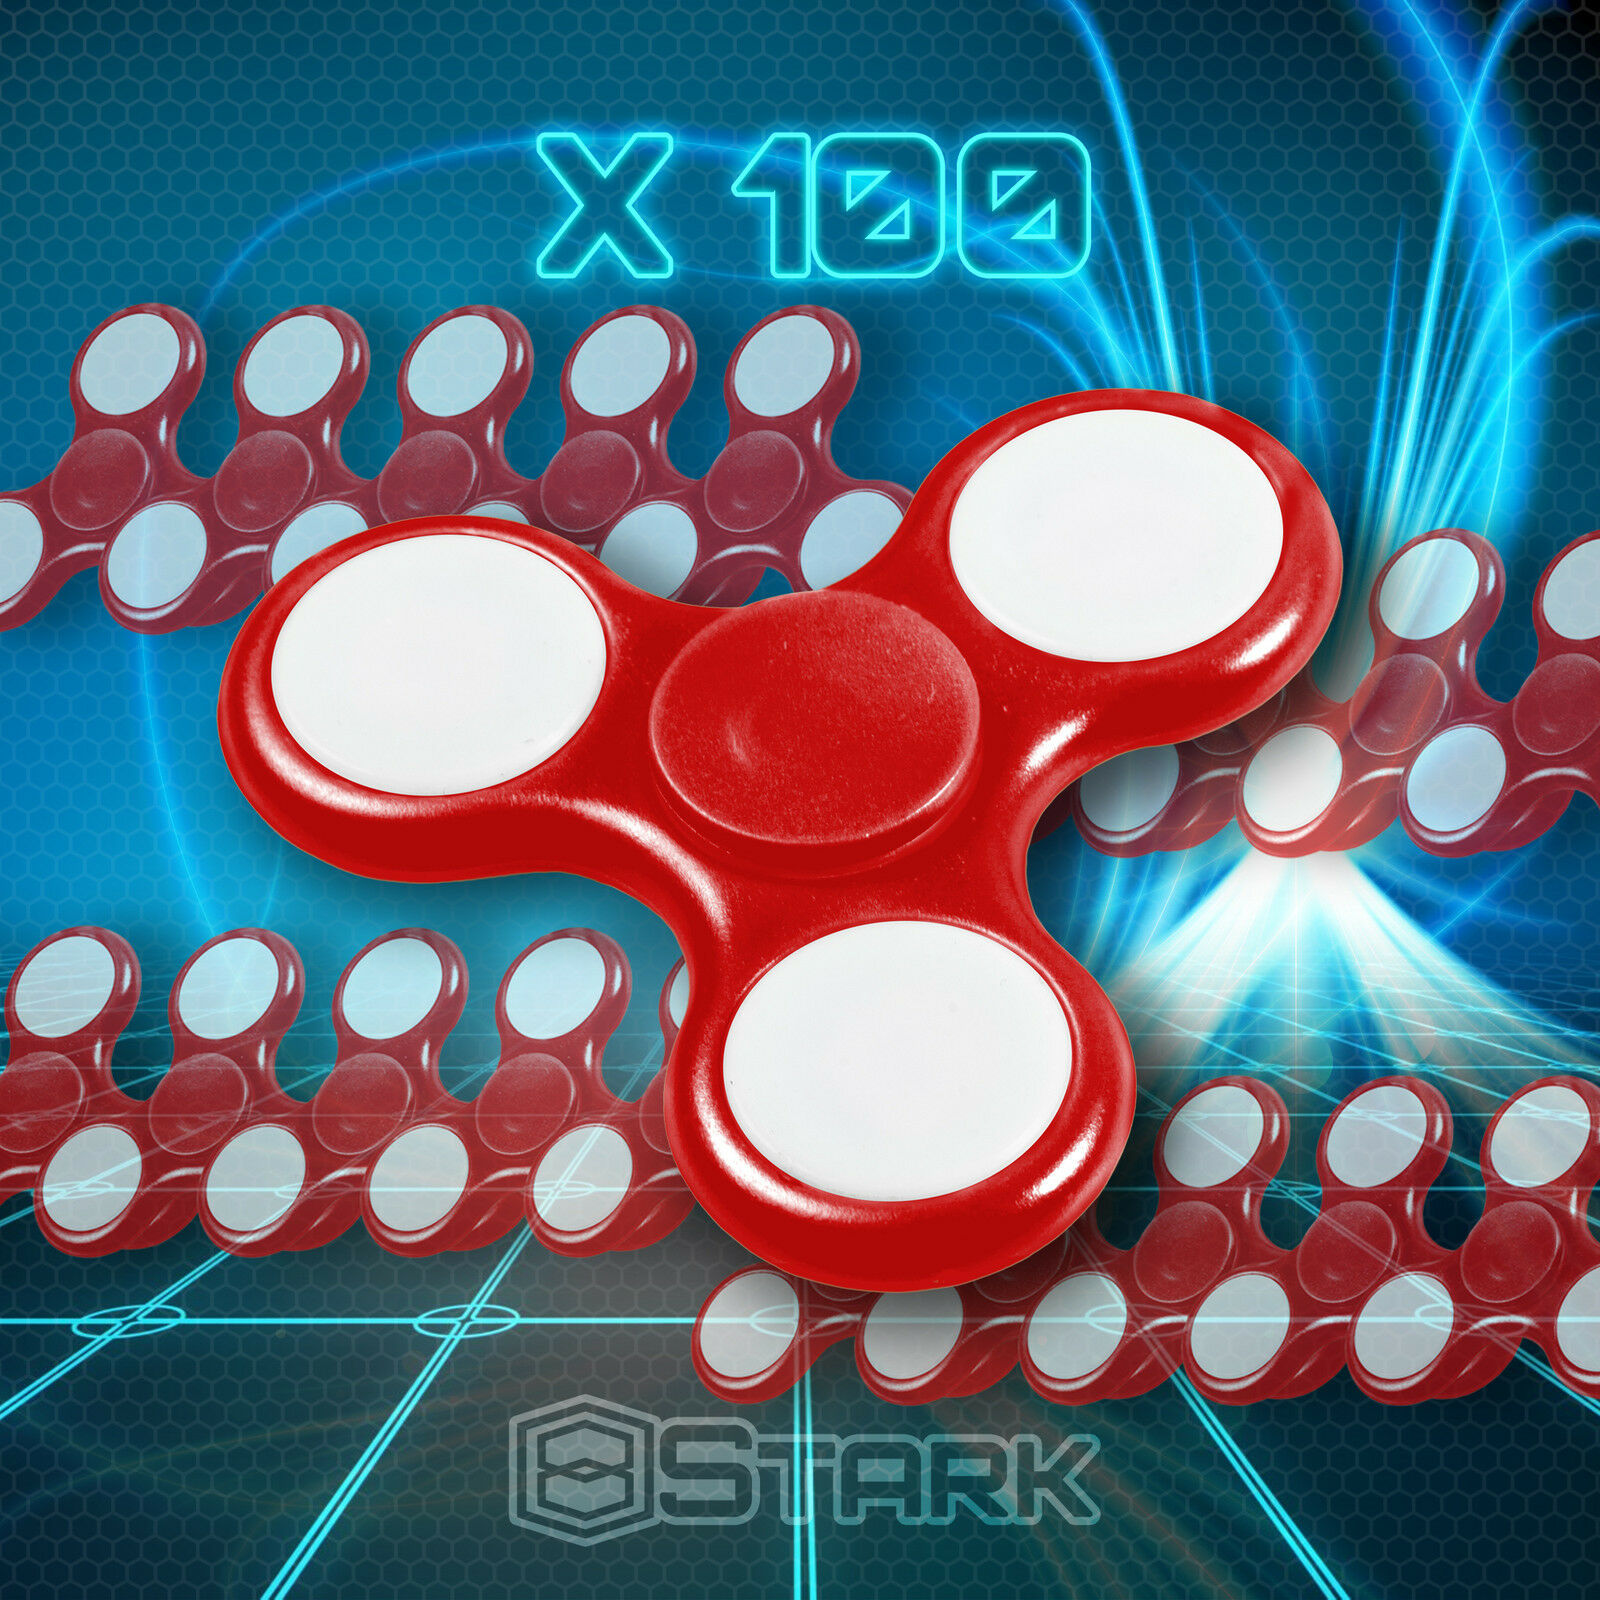 ROT LED Hand Spinner Tri Fidget Focus Desk Toy EDC ADHD Autism KIDS ADULT x100